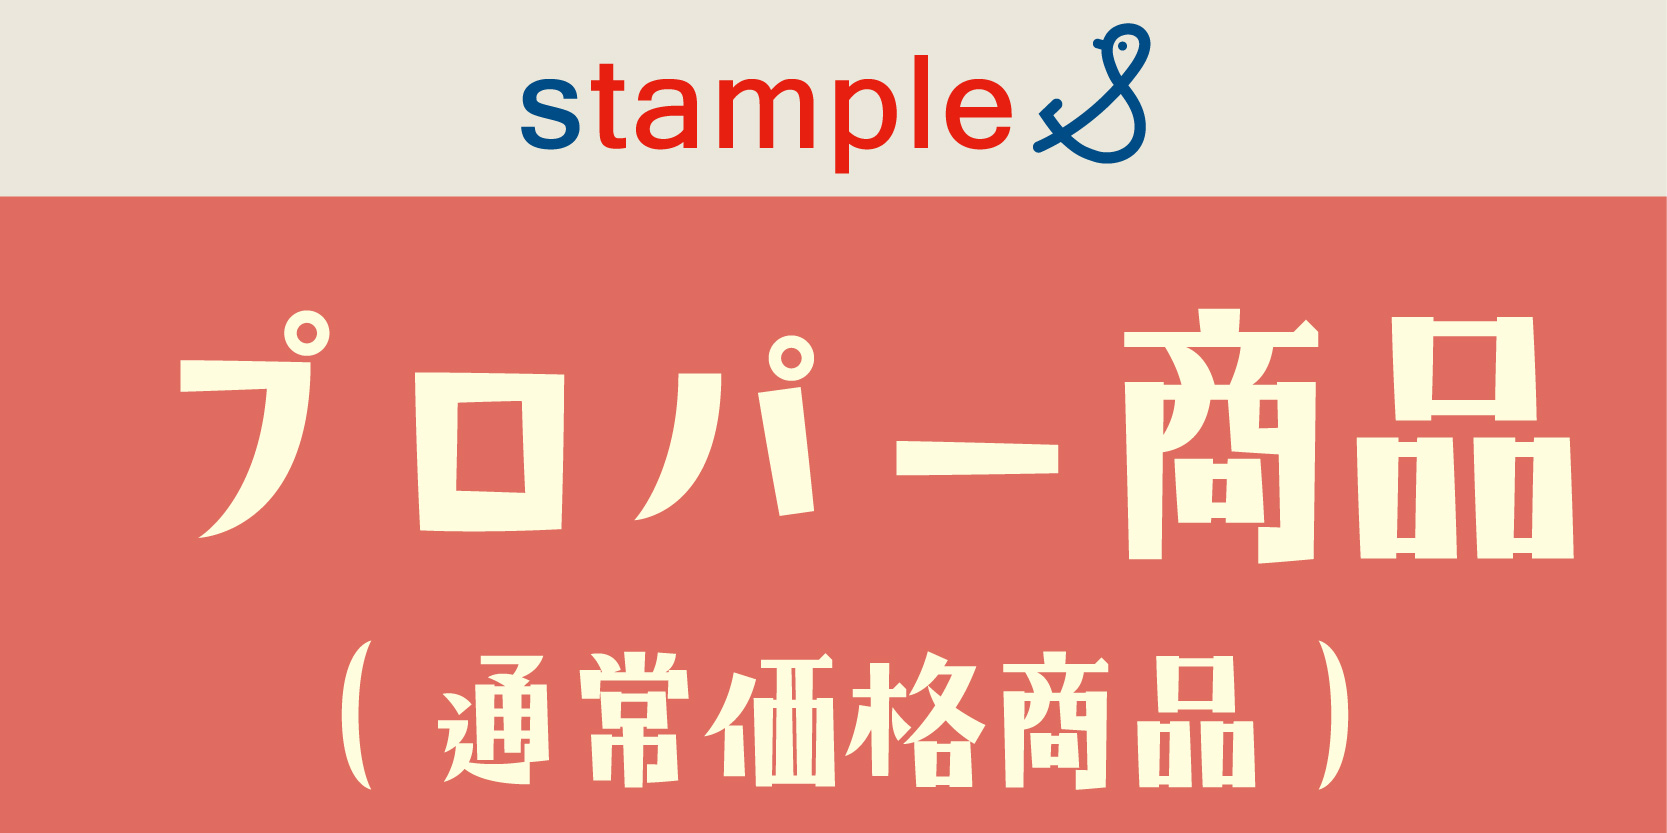 stample:プロパー商品(通常価格商品)